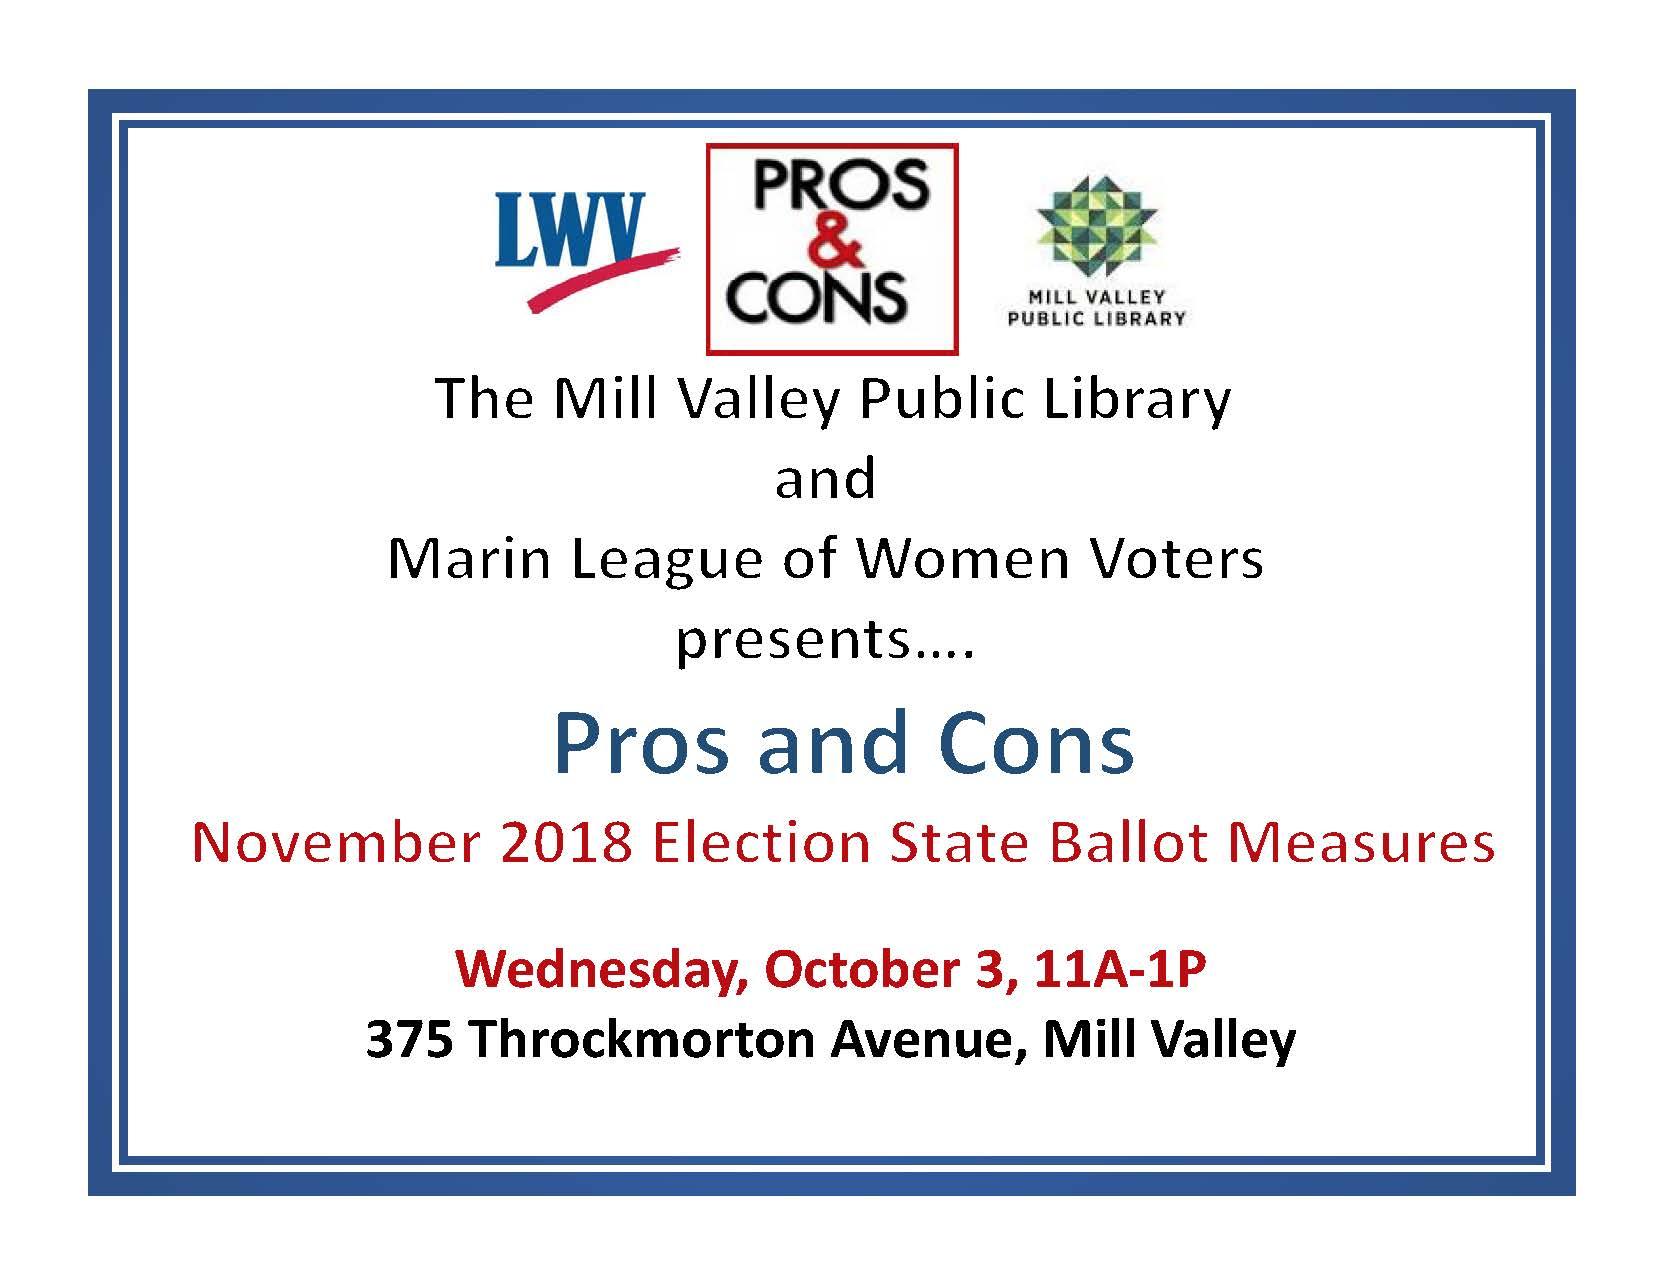 180917-Mill Vally Library Pros & Cons presentations 10.3.jpg